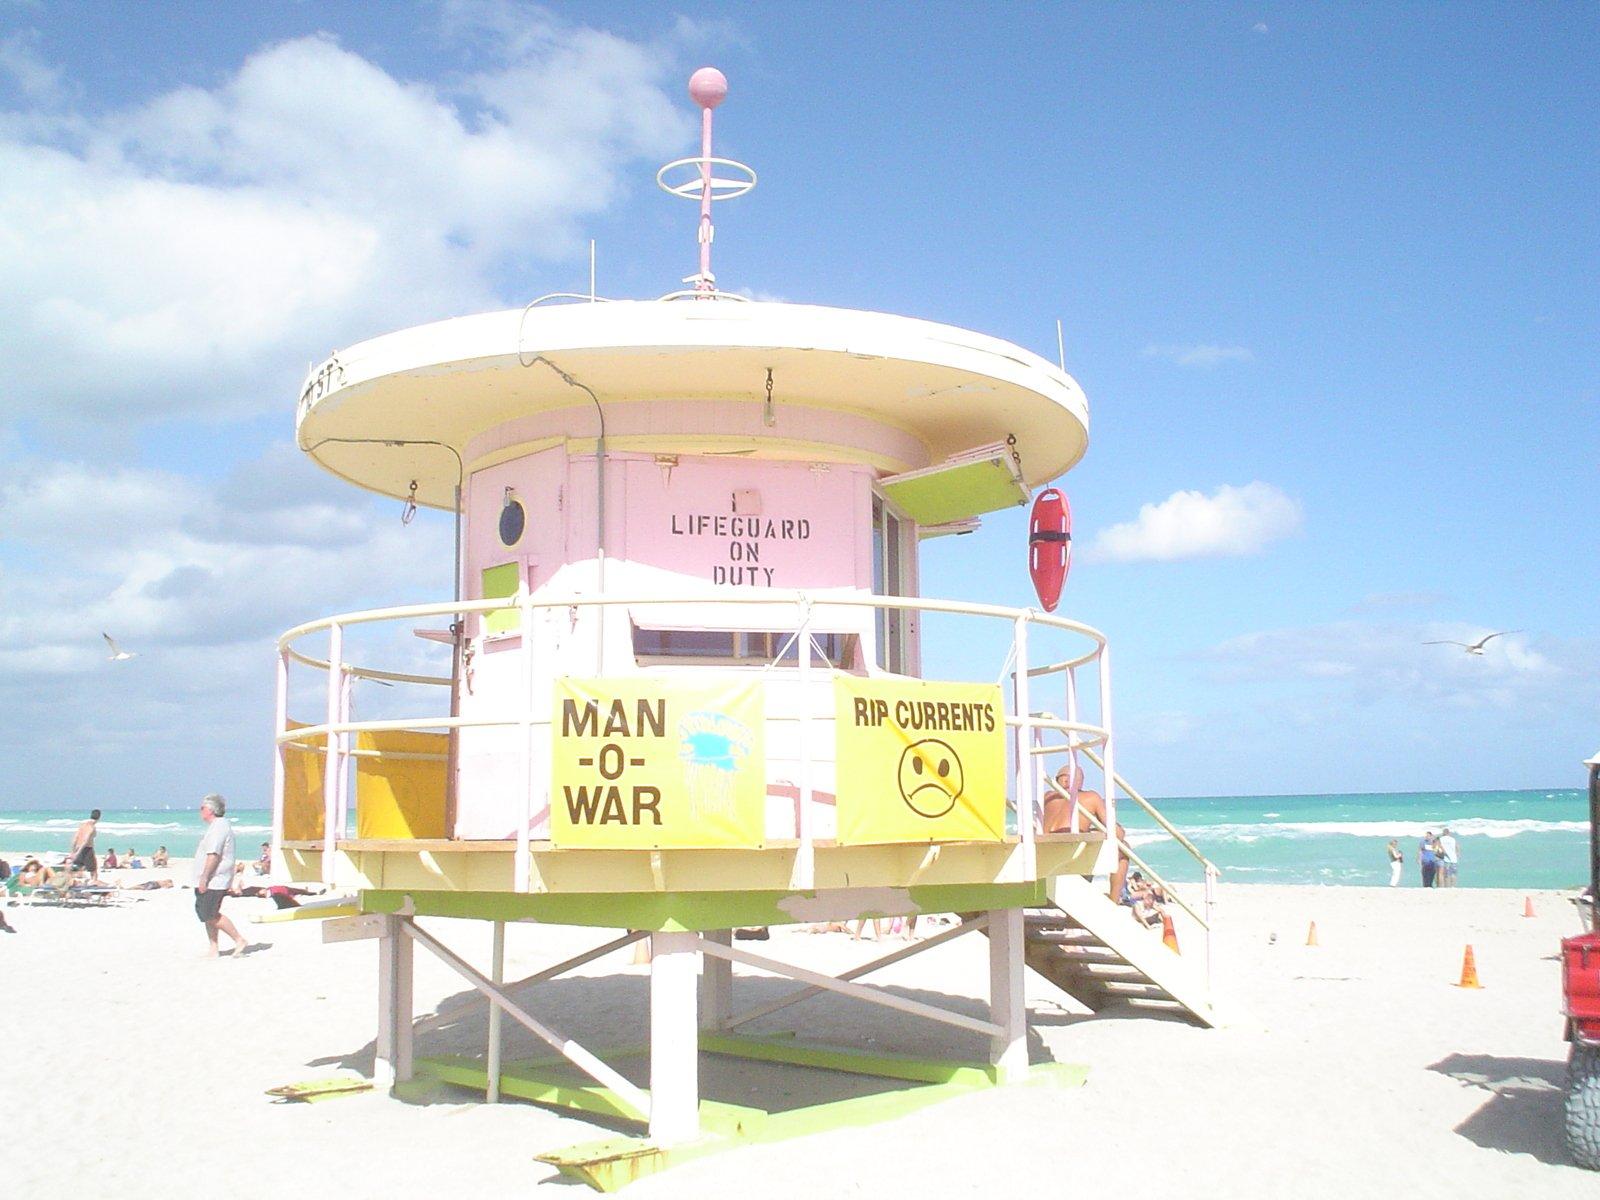 Free Lifeguard Station Stock Photo - FreeImages.com